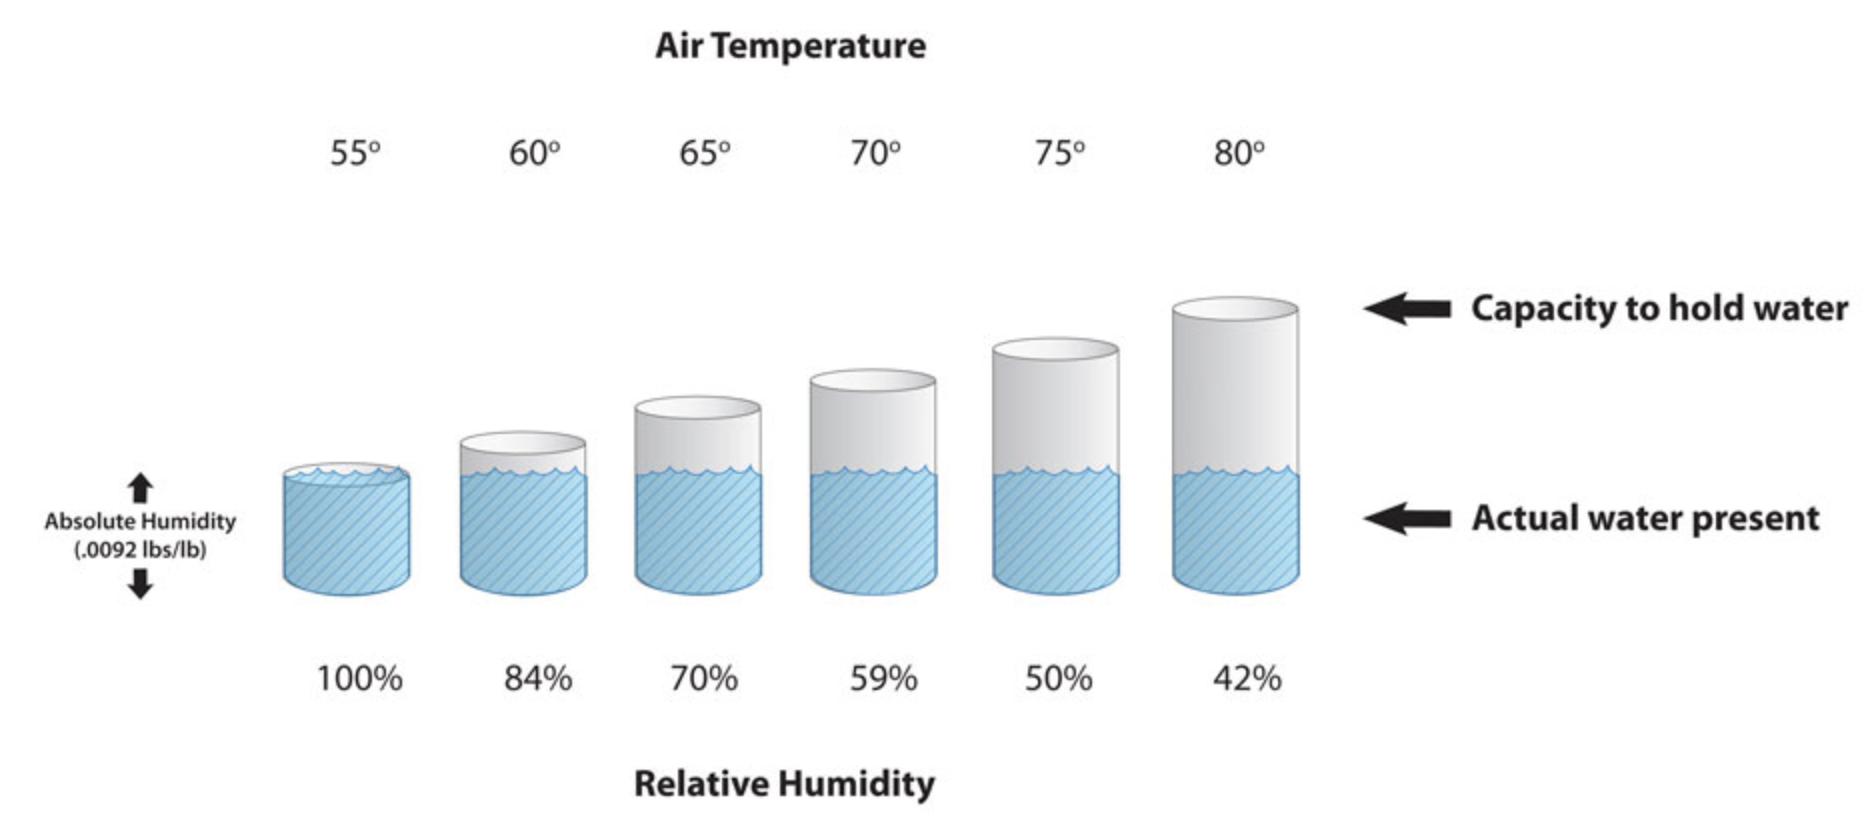 Relative versus absolute humidity